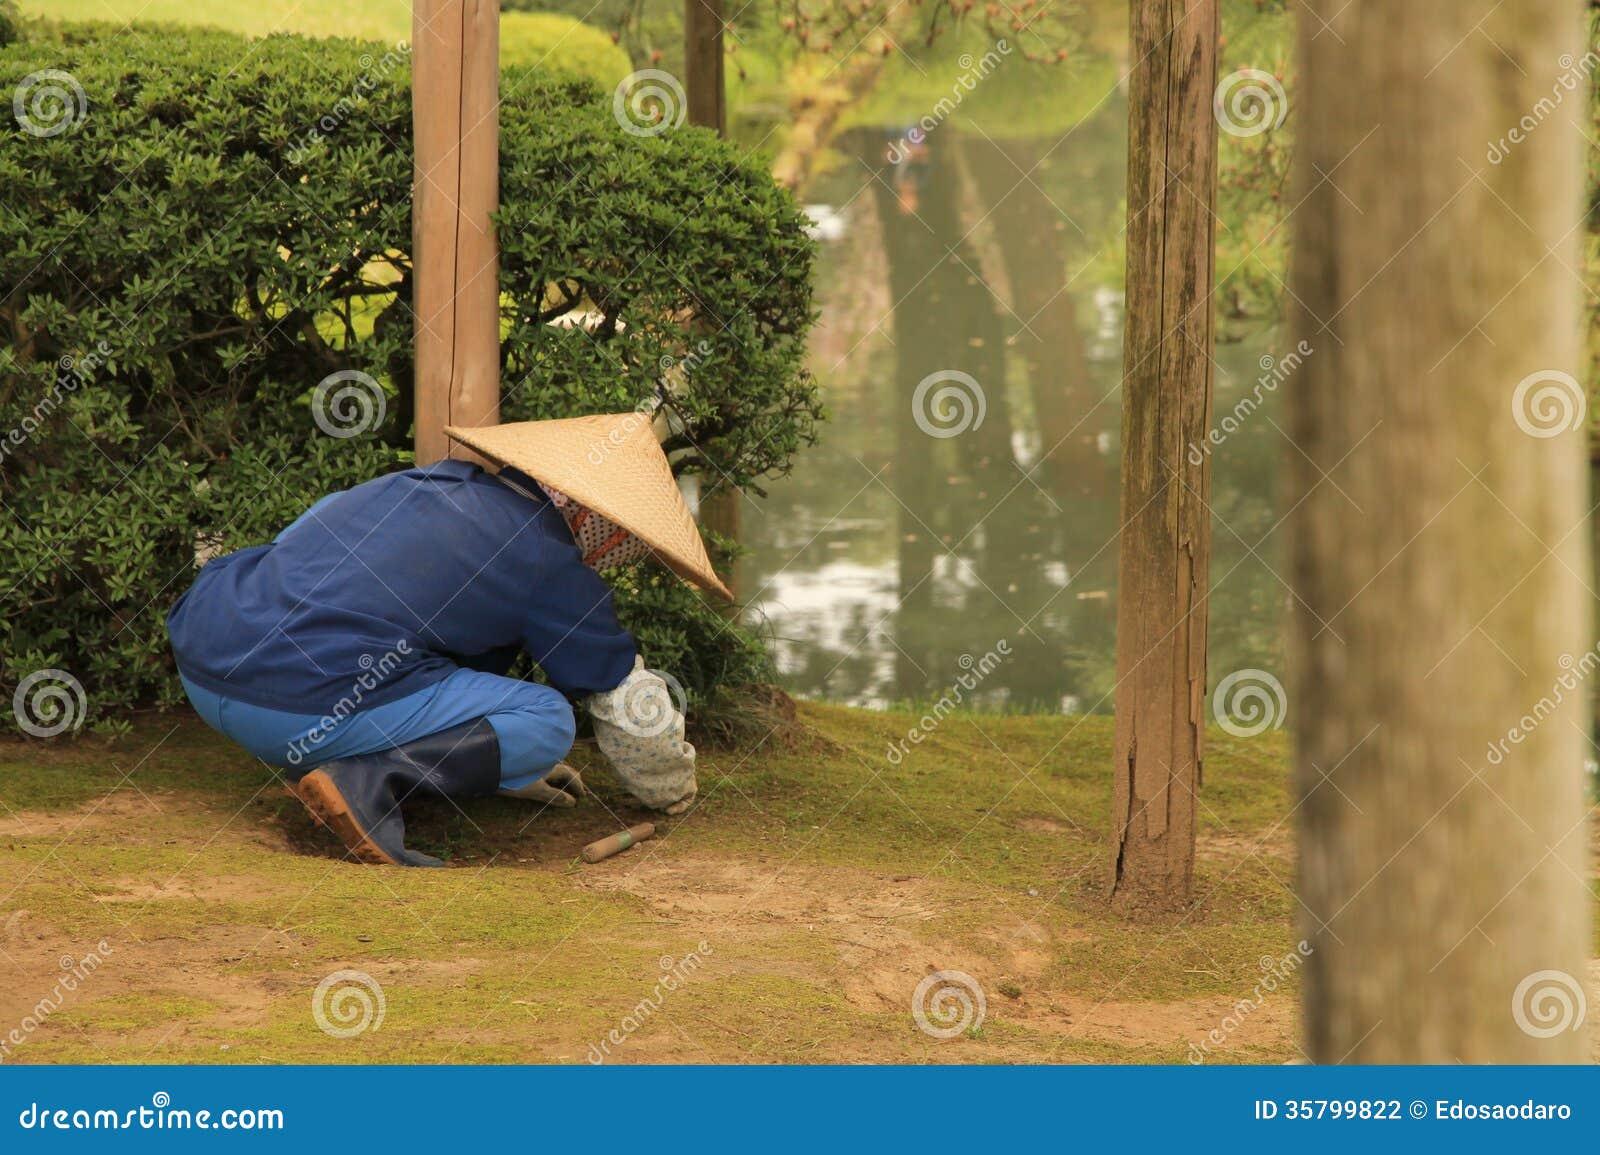 Nice Japanese Gardener #1: Japanese Gardener Editorial Photography